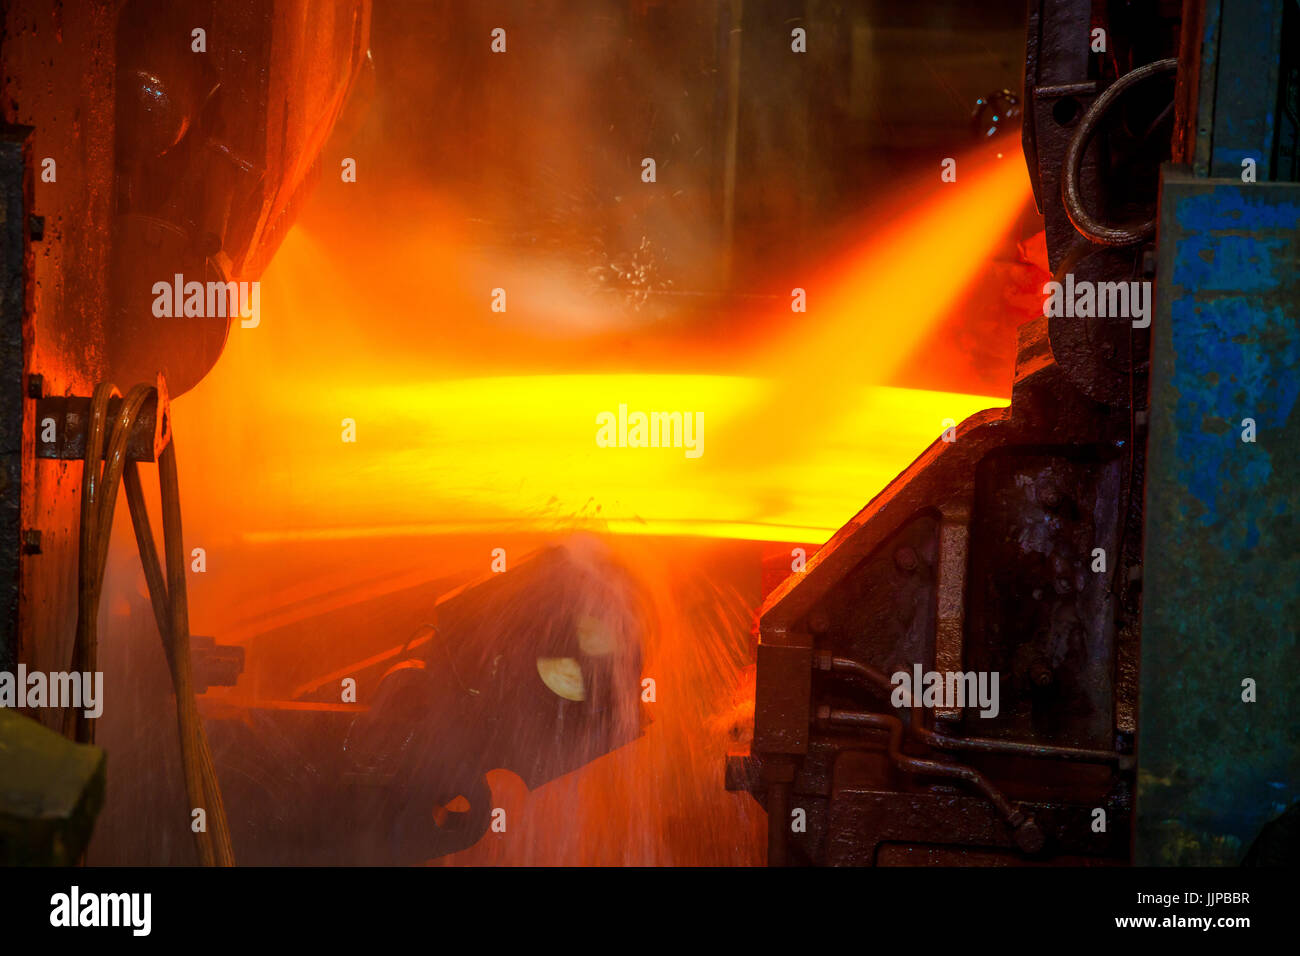 ThyssenKrupp steelwork in Duisburg, Ruhr Area, North Rhine-Westphalia, Germany, Europe. Gieswalzanlage, ThyssenKrupp - Stock Image